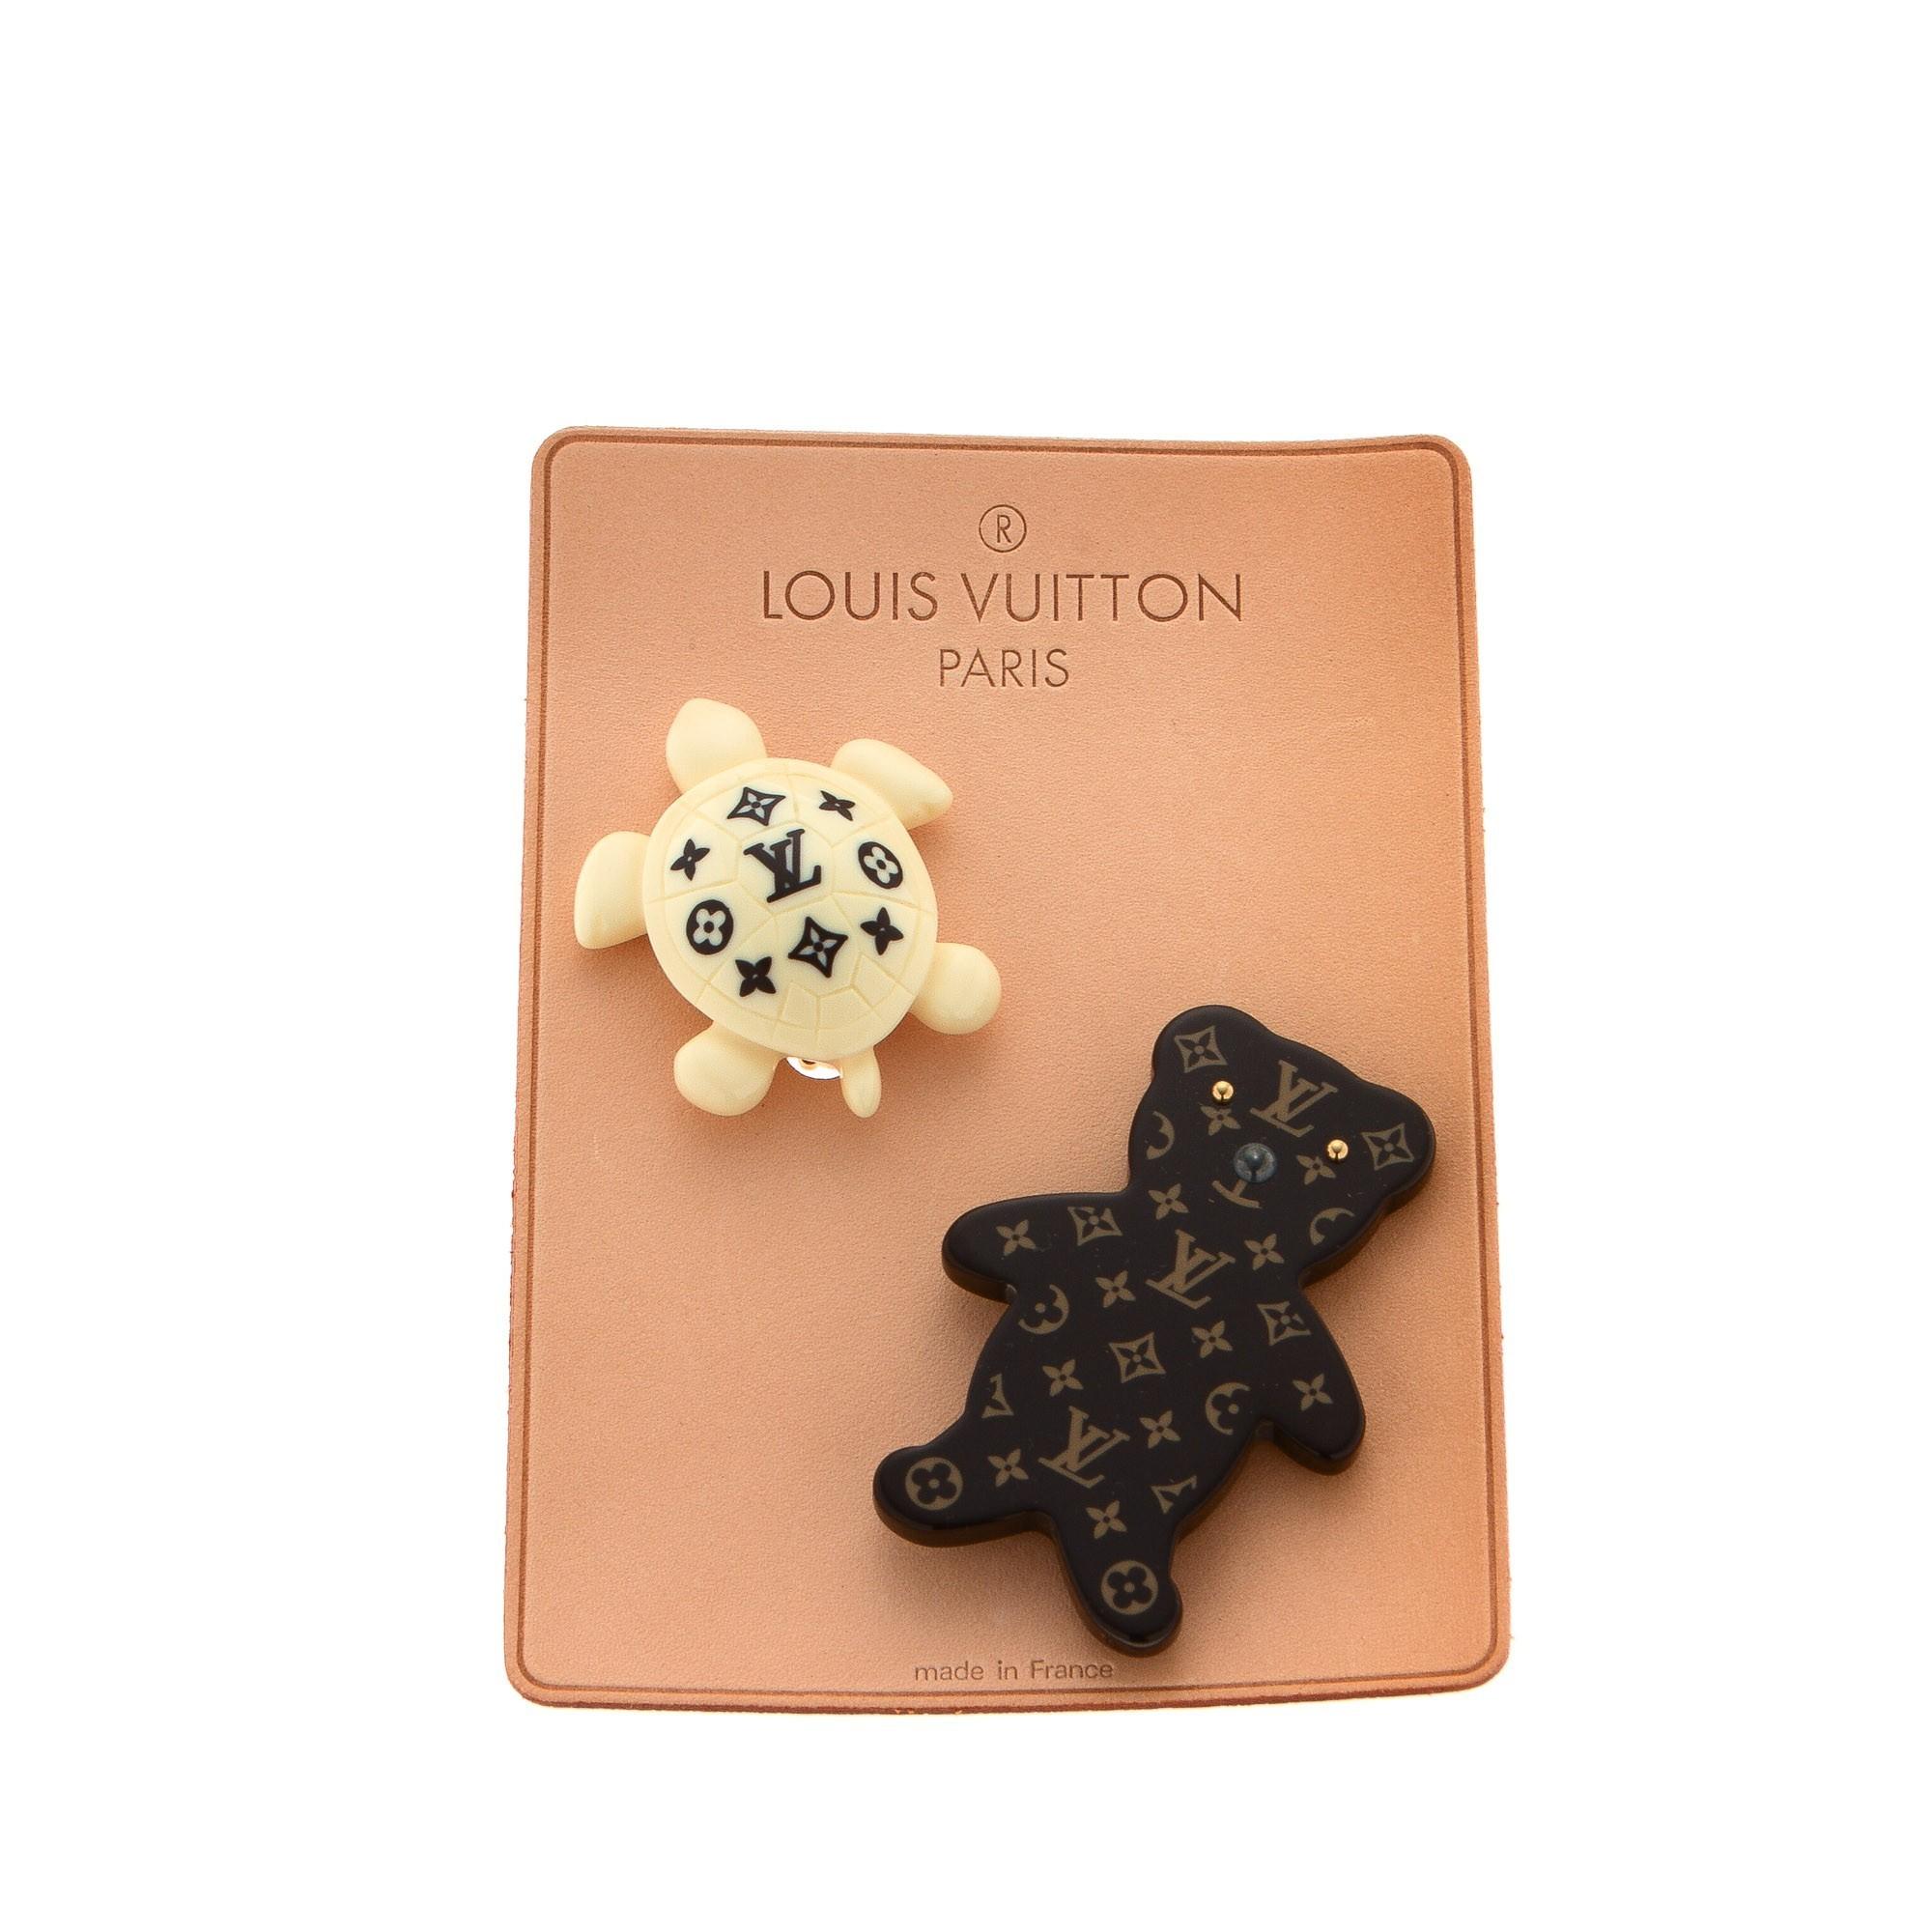 Louis Vuitton Brooches  Monogram Plastic Brooch LXRCO